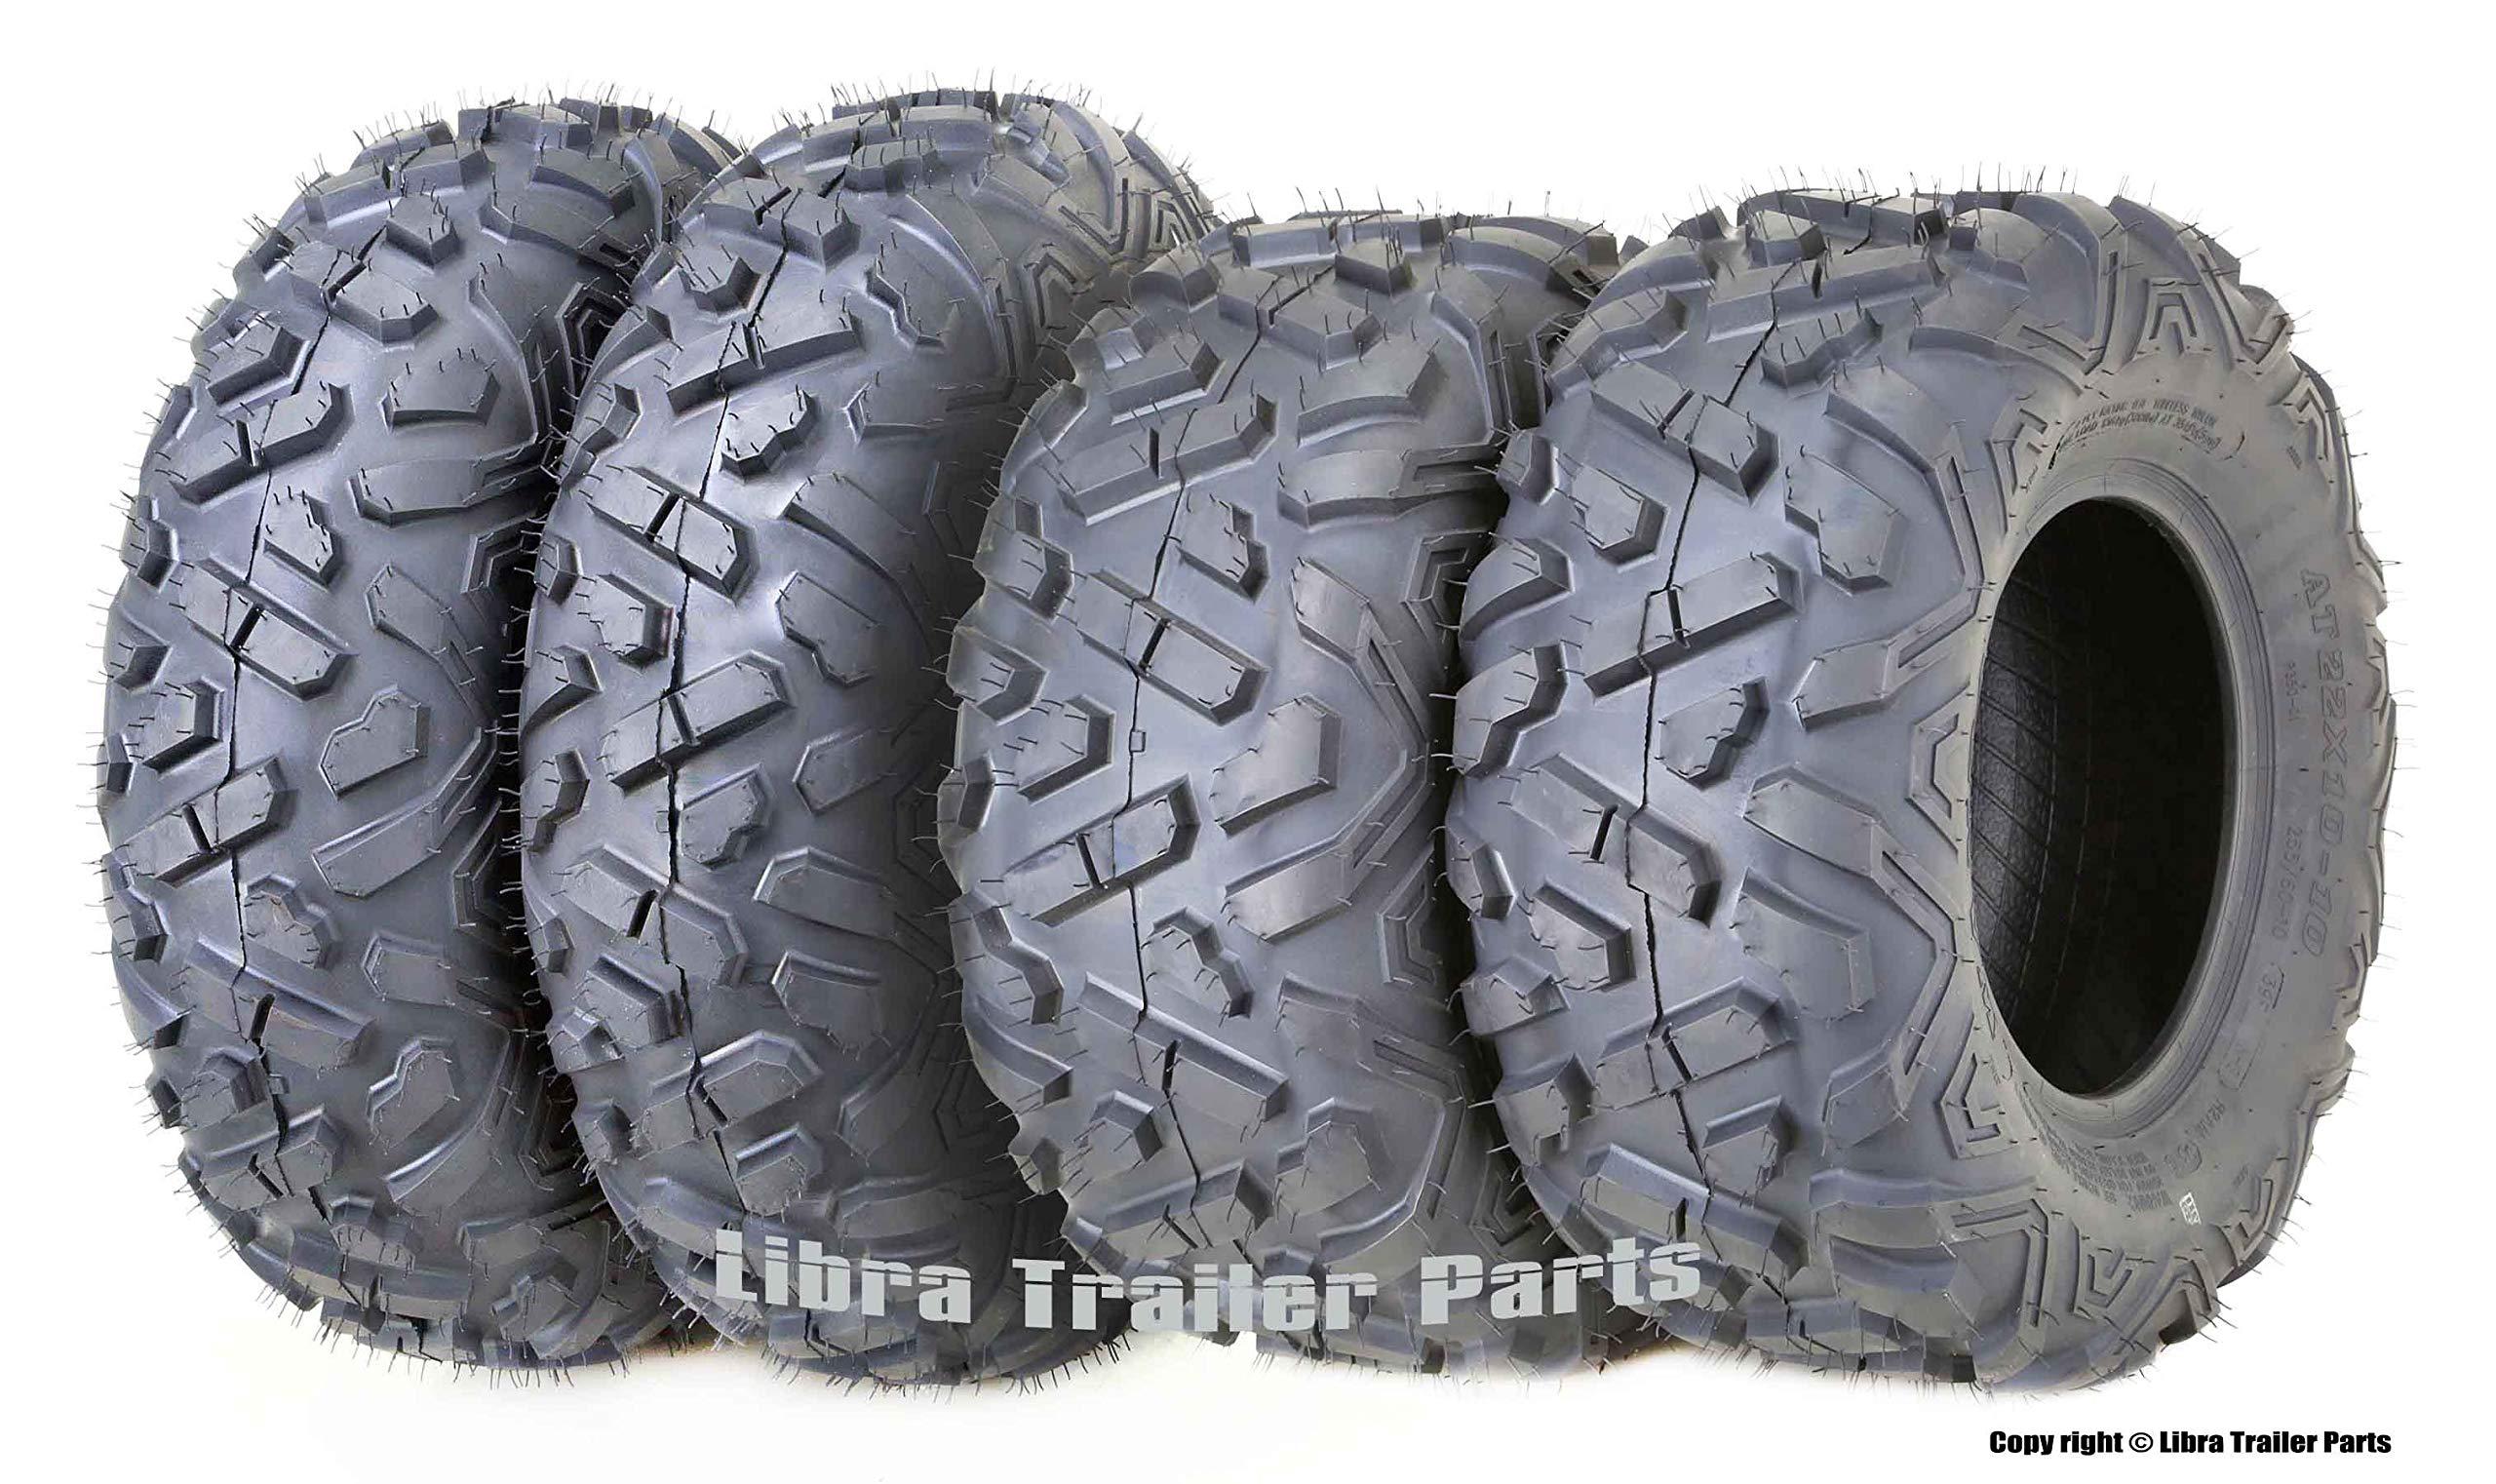 Set 4 WANDA ATV Tires 23x7-10 Front & 22x10-10 Rear Big Horn Style ... by WANDA